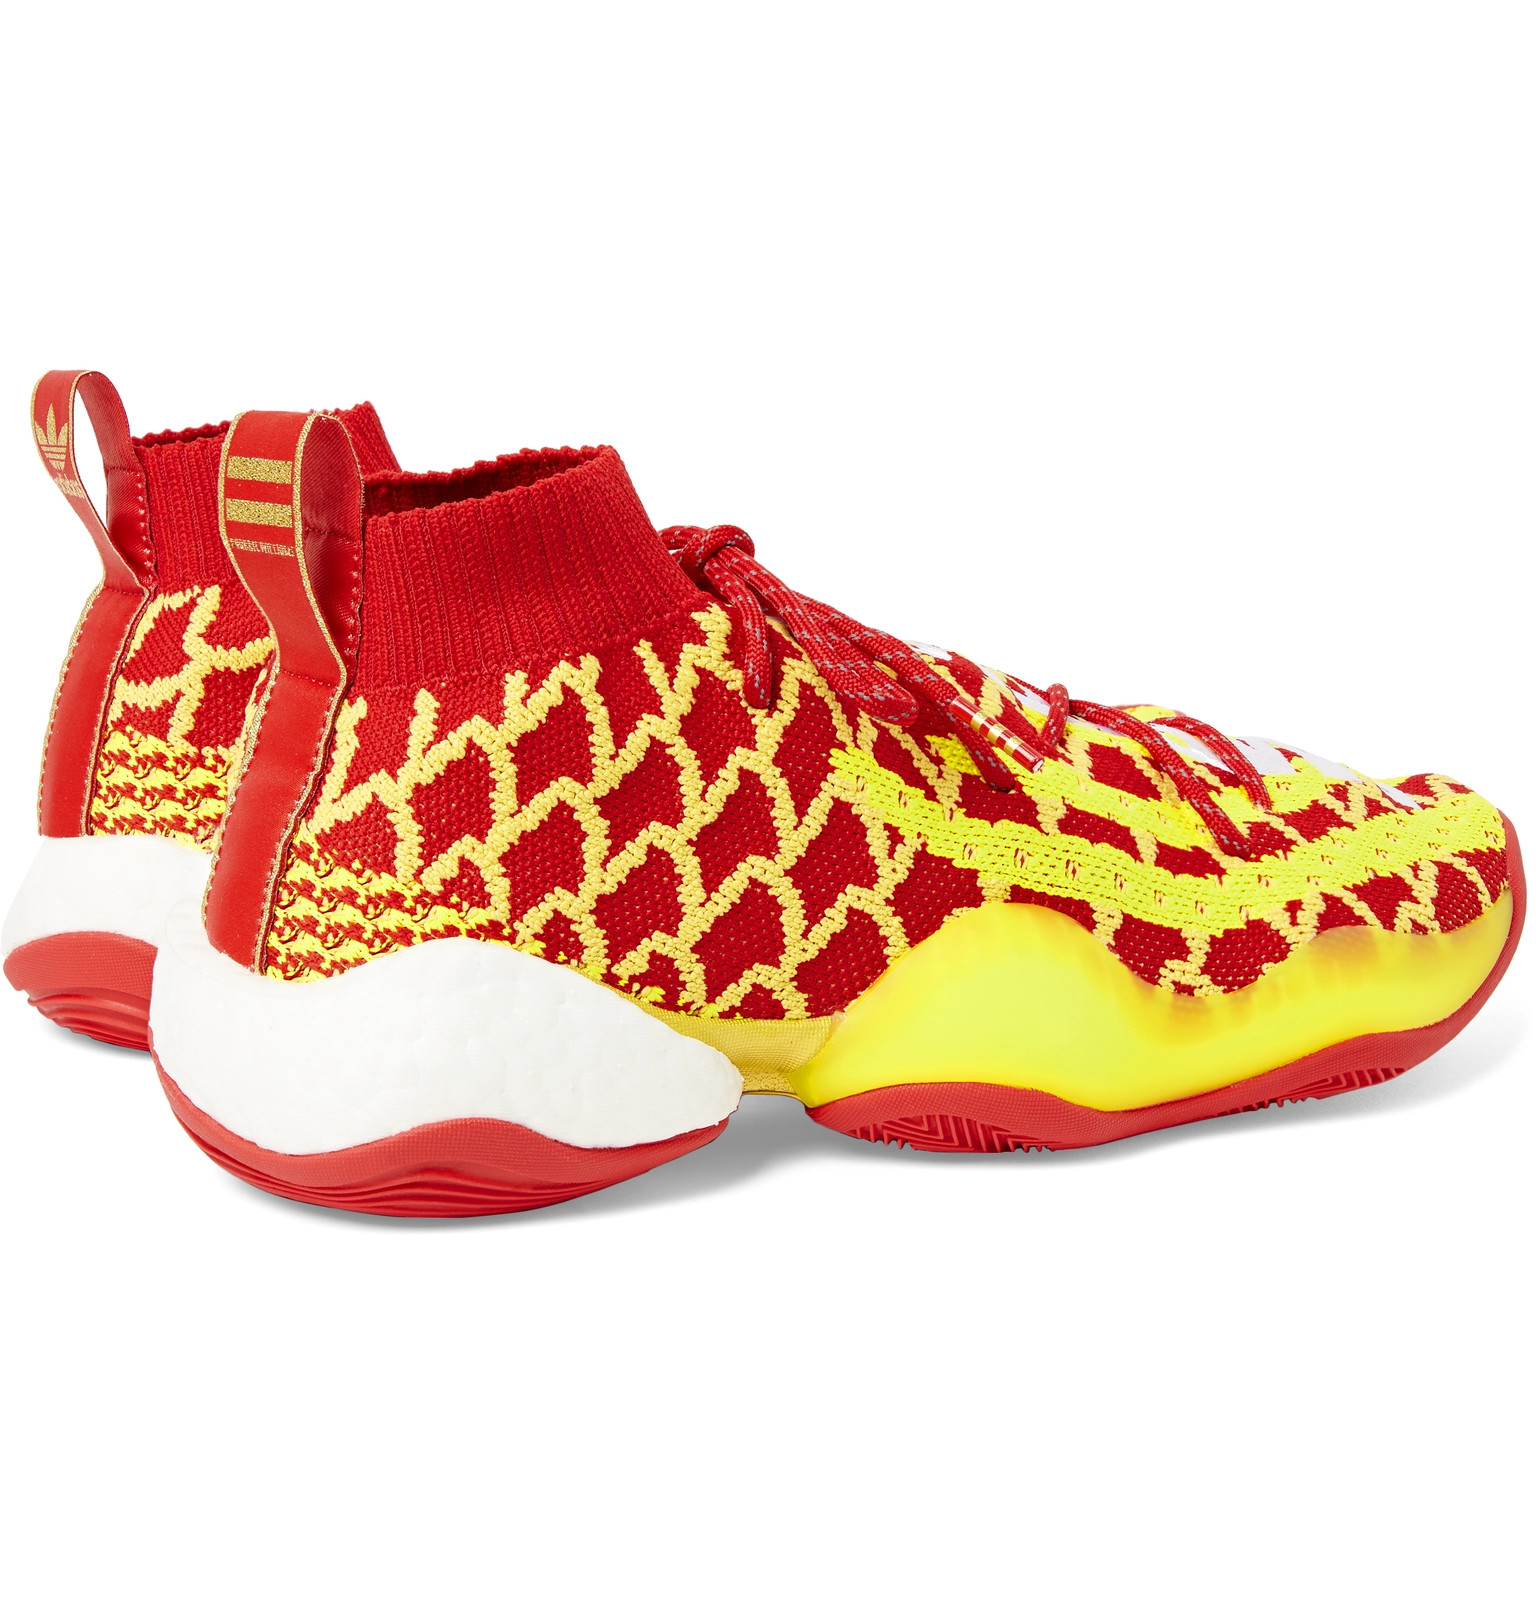 e2bead4d0 adidas Consortium - + Pharrell Williams CNY Crazy BYW Primeknit Sneakers